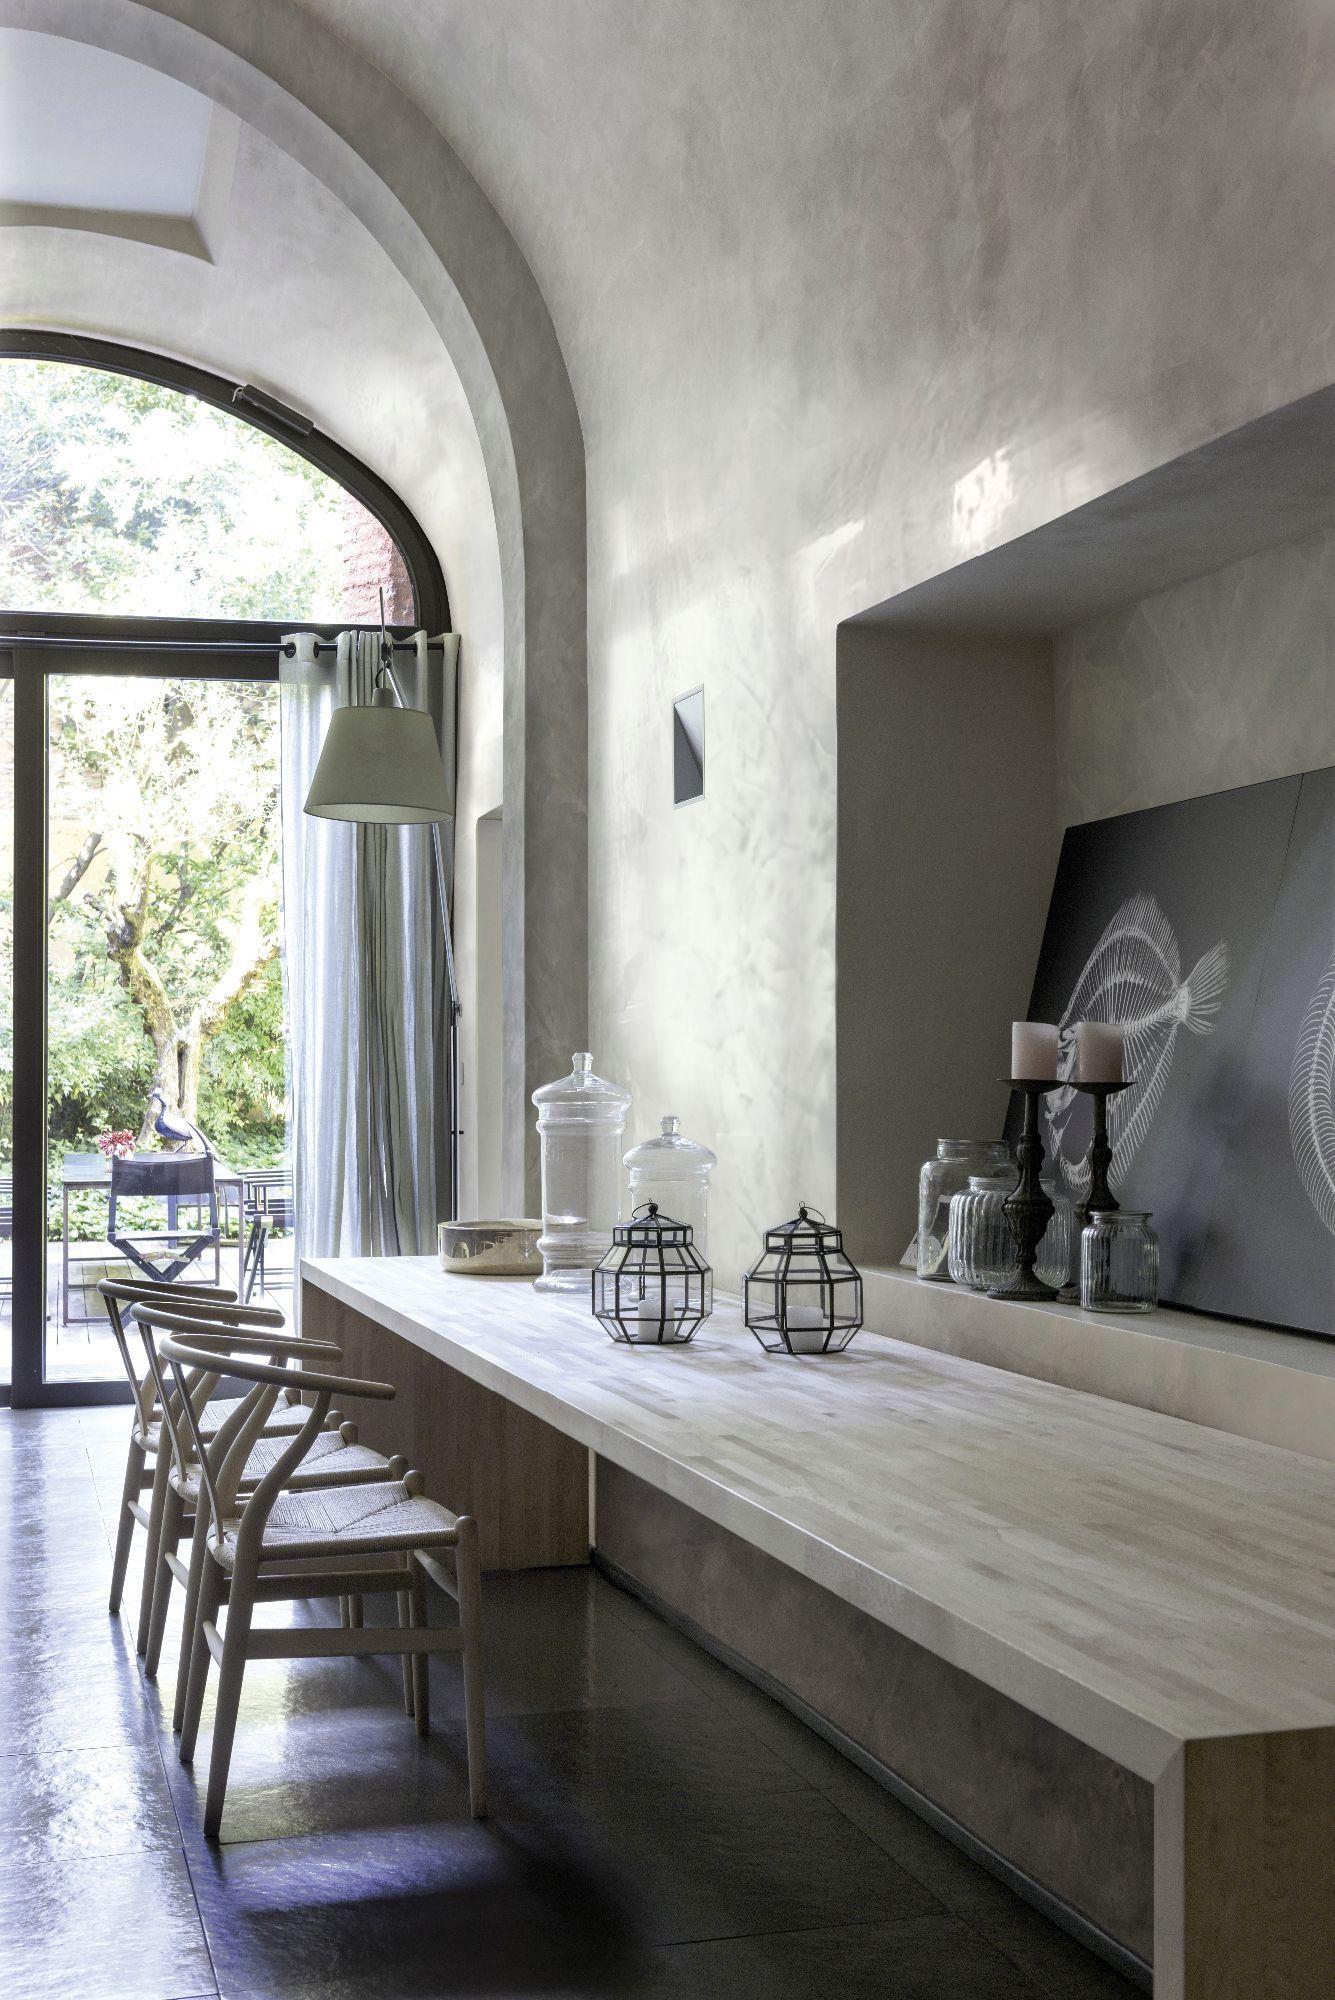 Pittura Stucco Veneziano Foto modern style with stucco veneziano | house